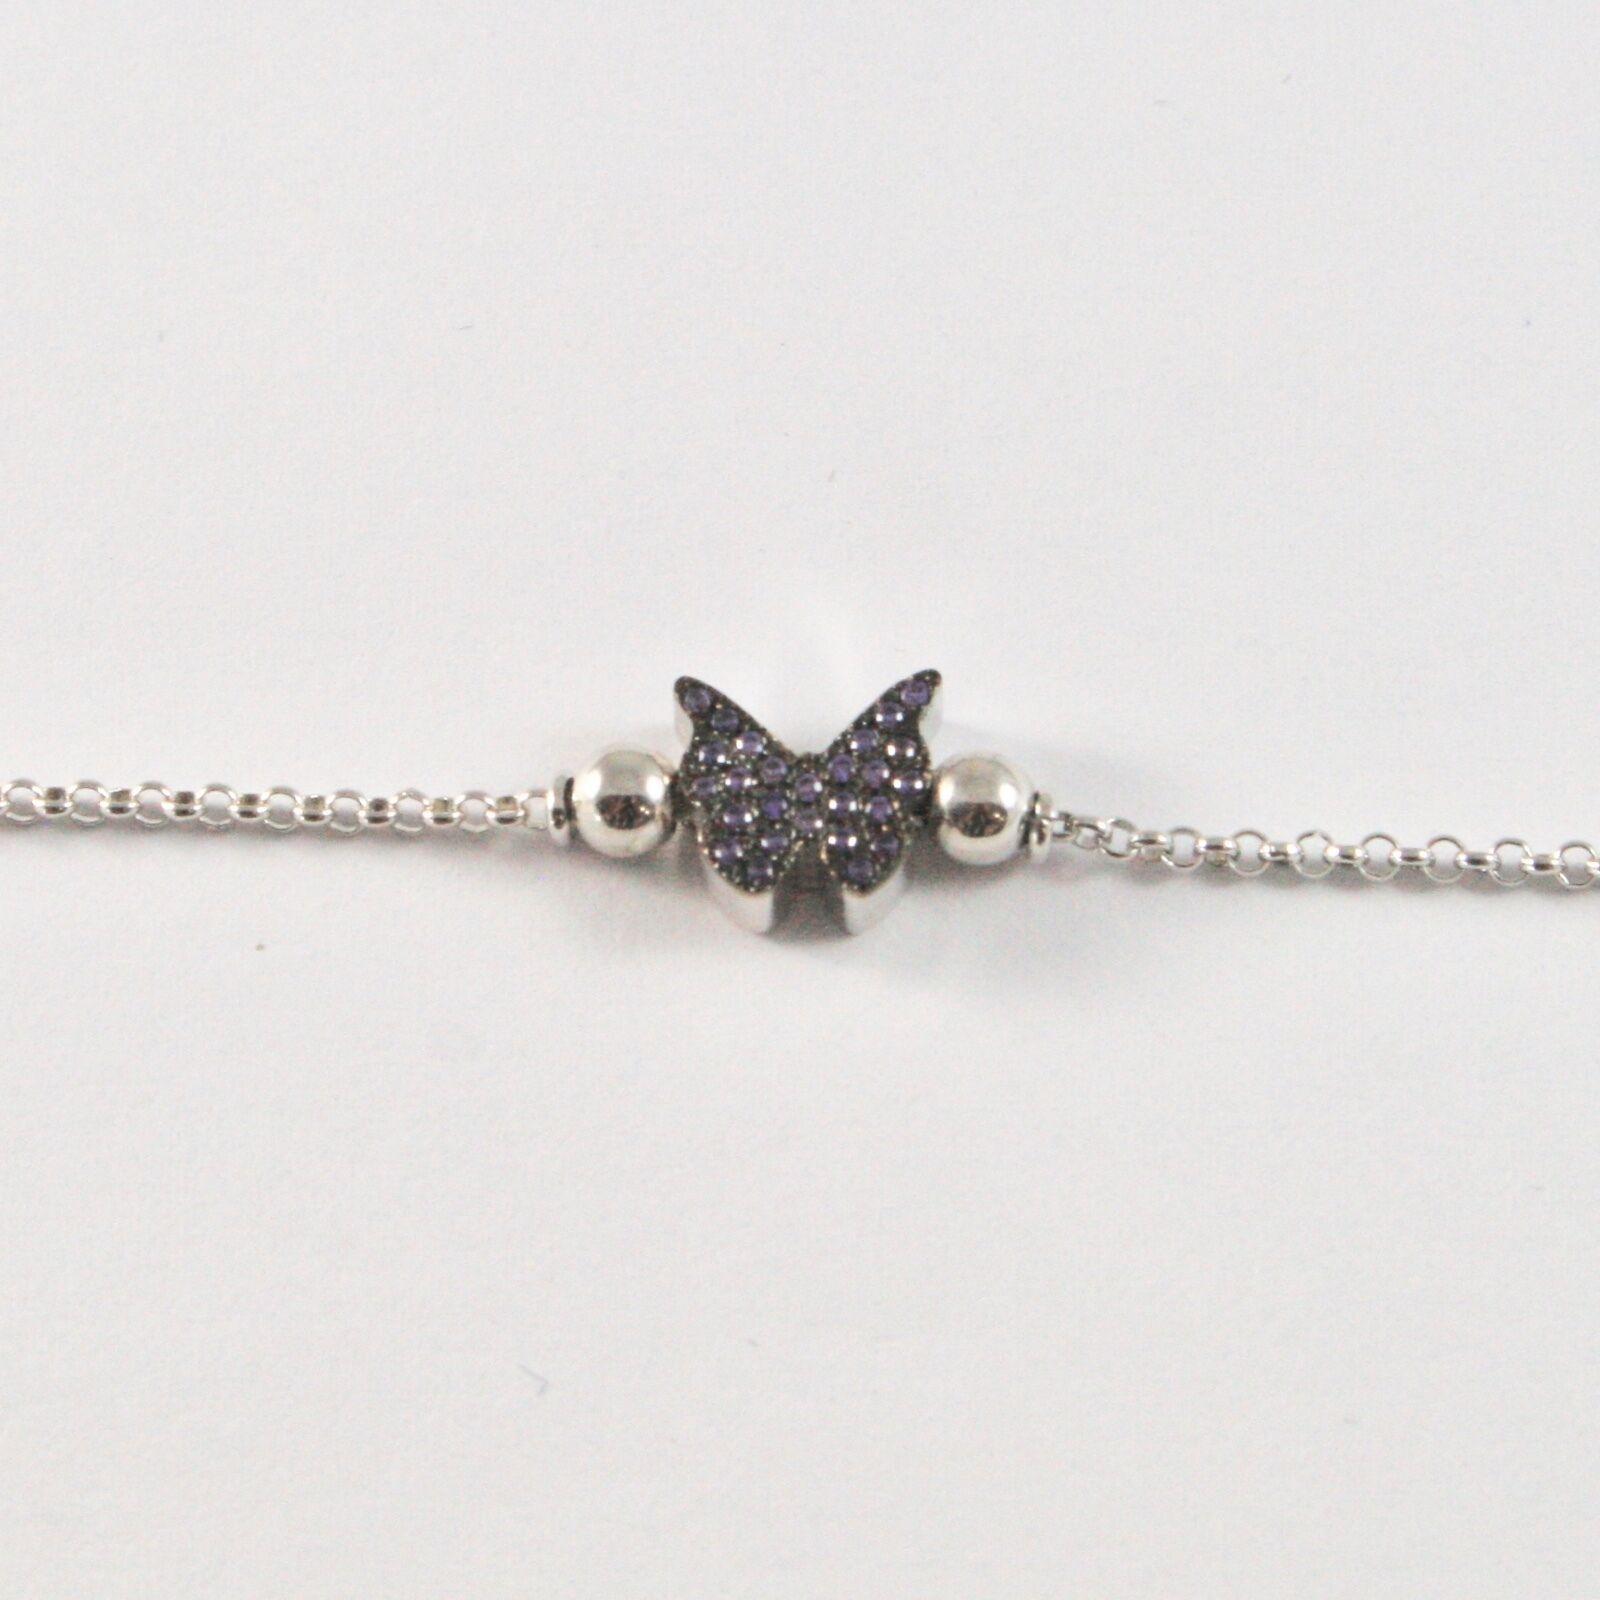 Silber Armband 925 Jack&co mit Schmetterling Stilisiert Zirkonia Cubic JCB0886 image 2